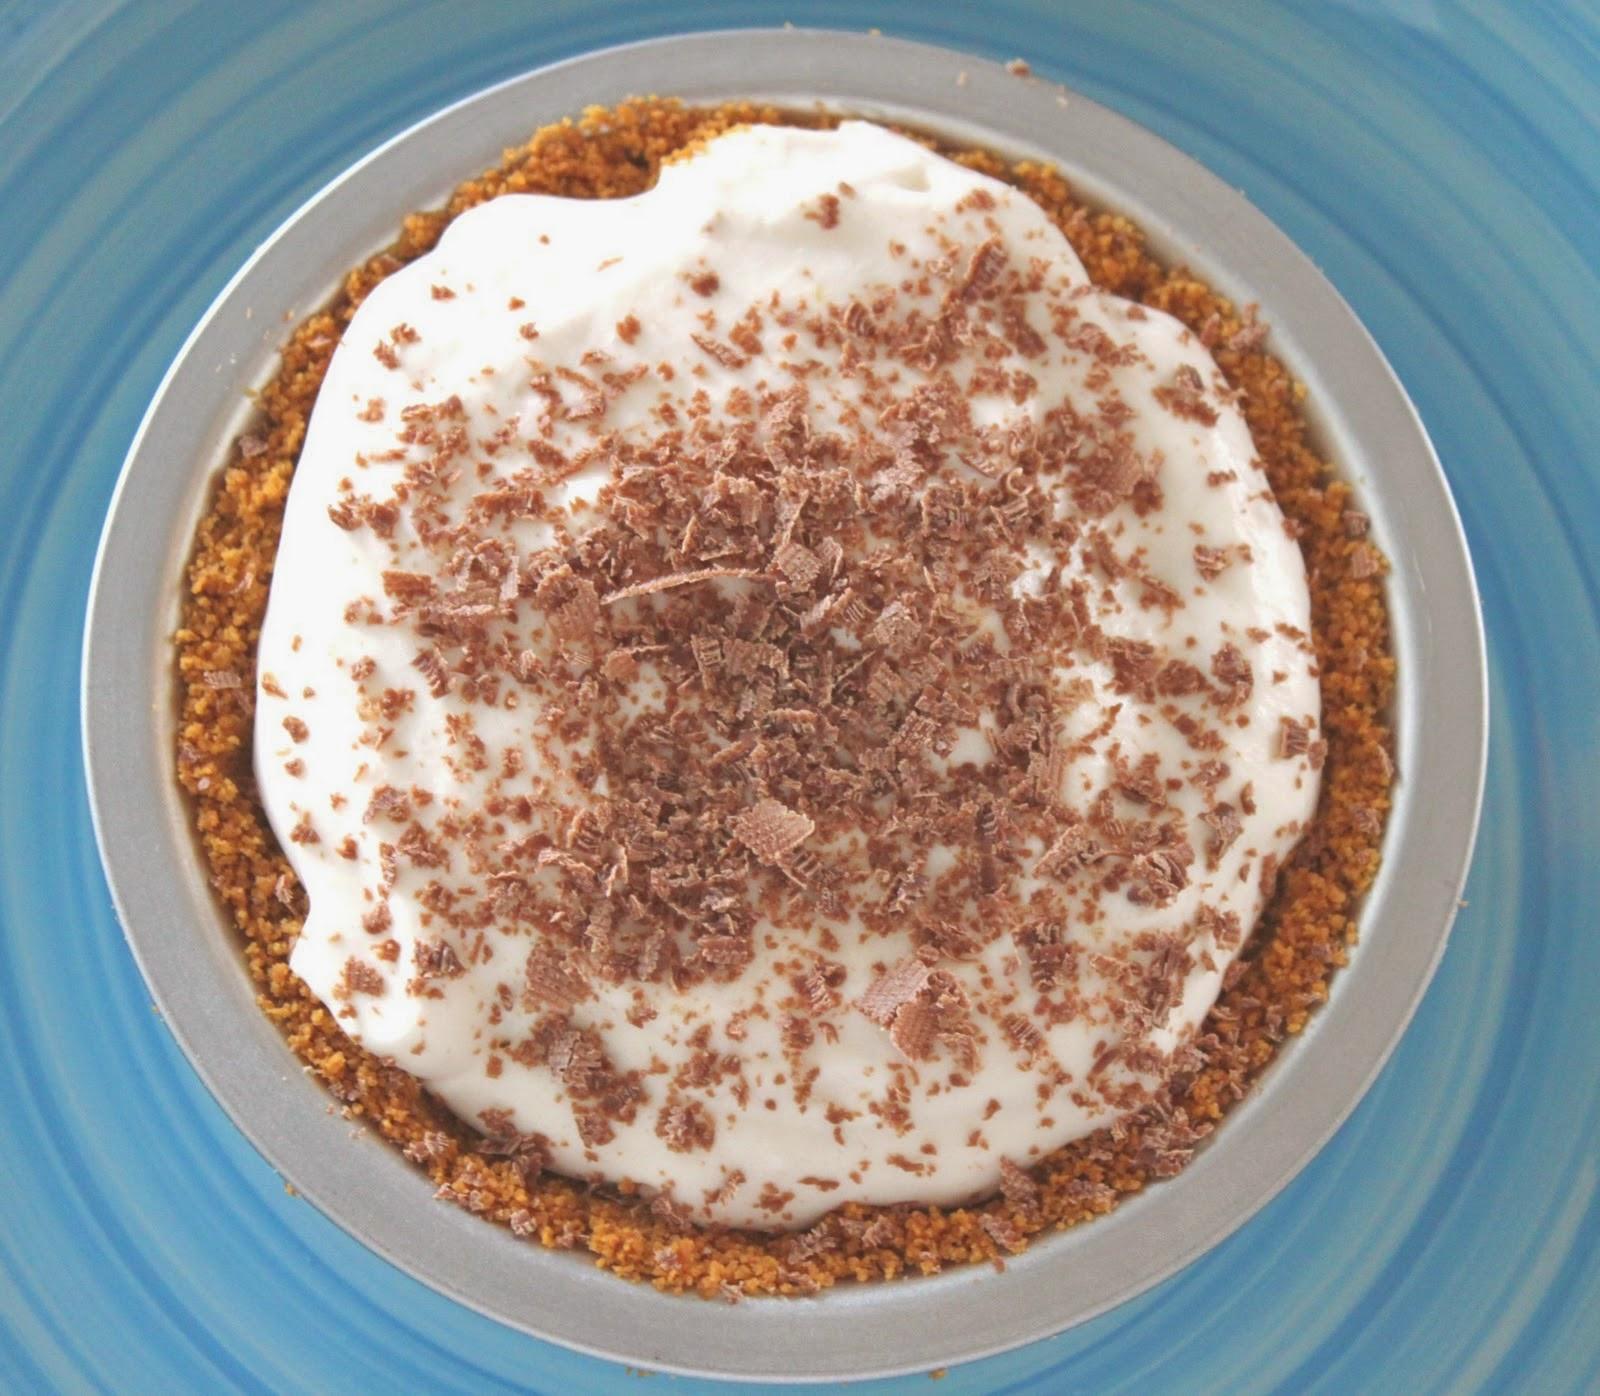 http://flourtrader.blogspot.com/2011/02/brandy-alexander-pie.html